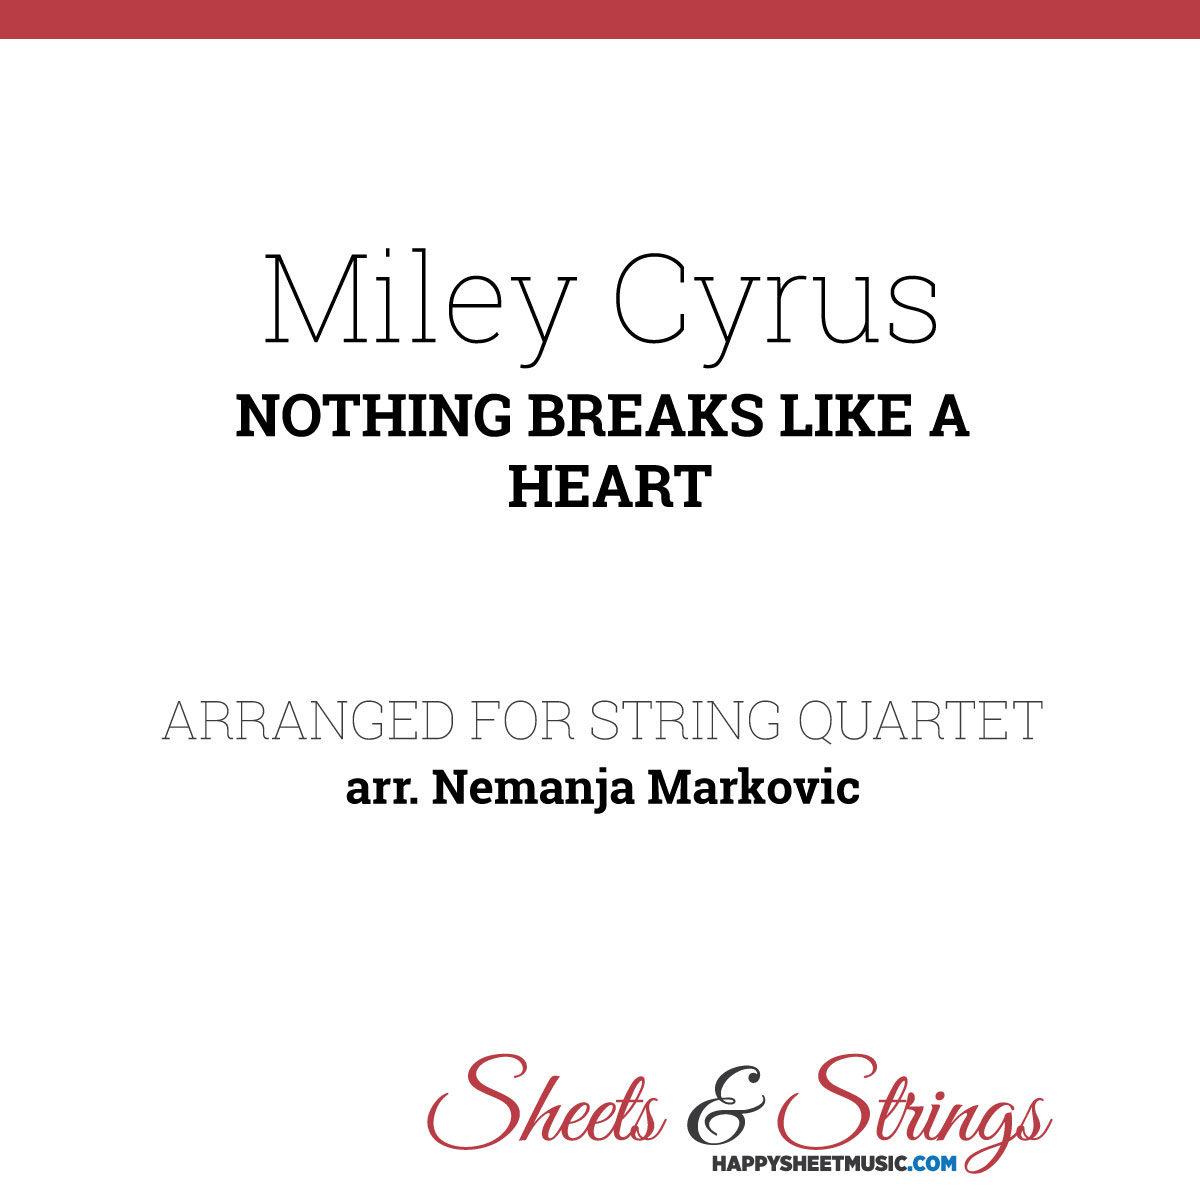 Miley Cyrus ft. Mark Ronson - Nothing Breaks Like a Heart - Sheet Music for String Quartet - Music Arrangement for String Quartet